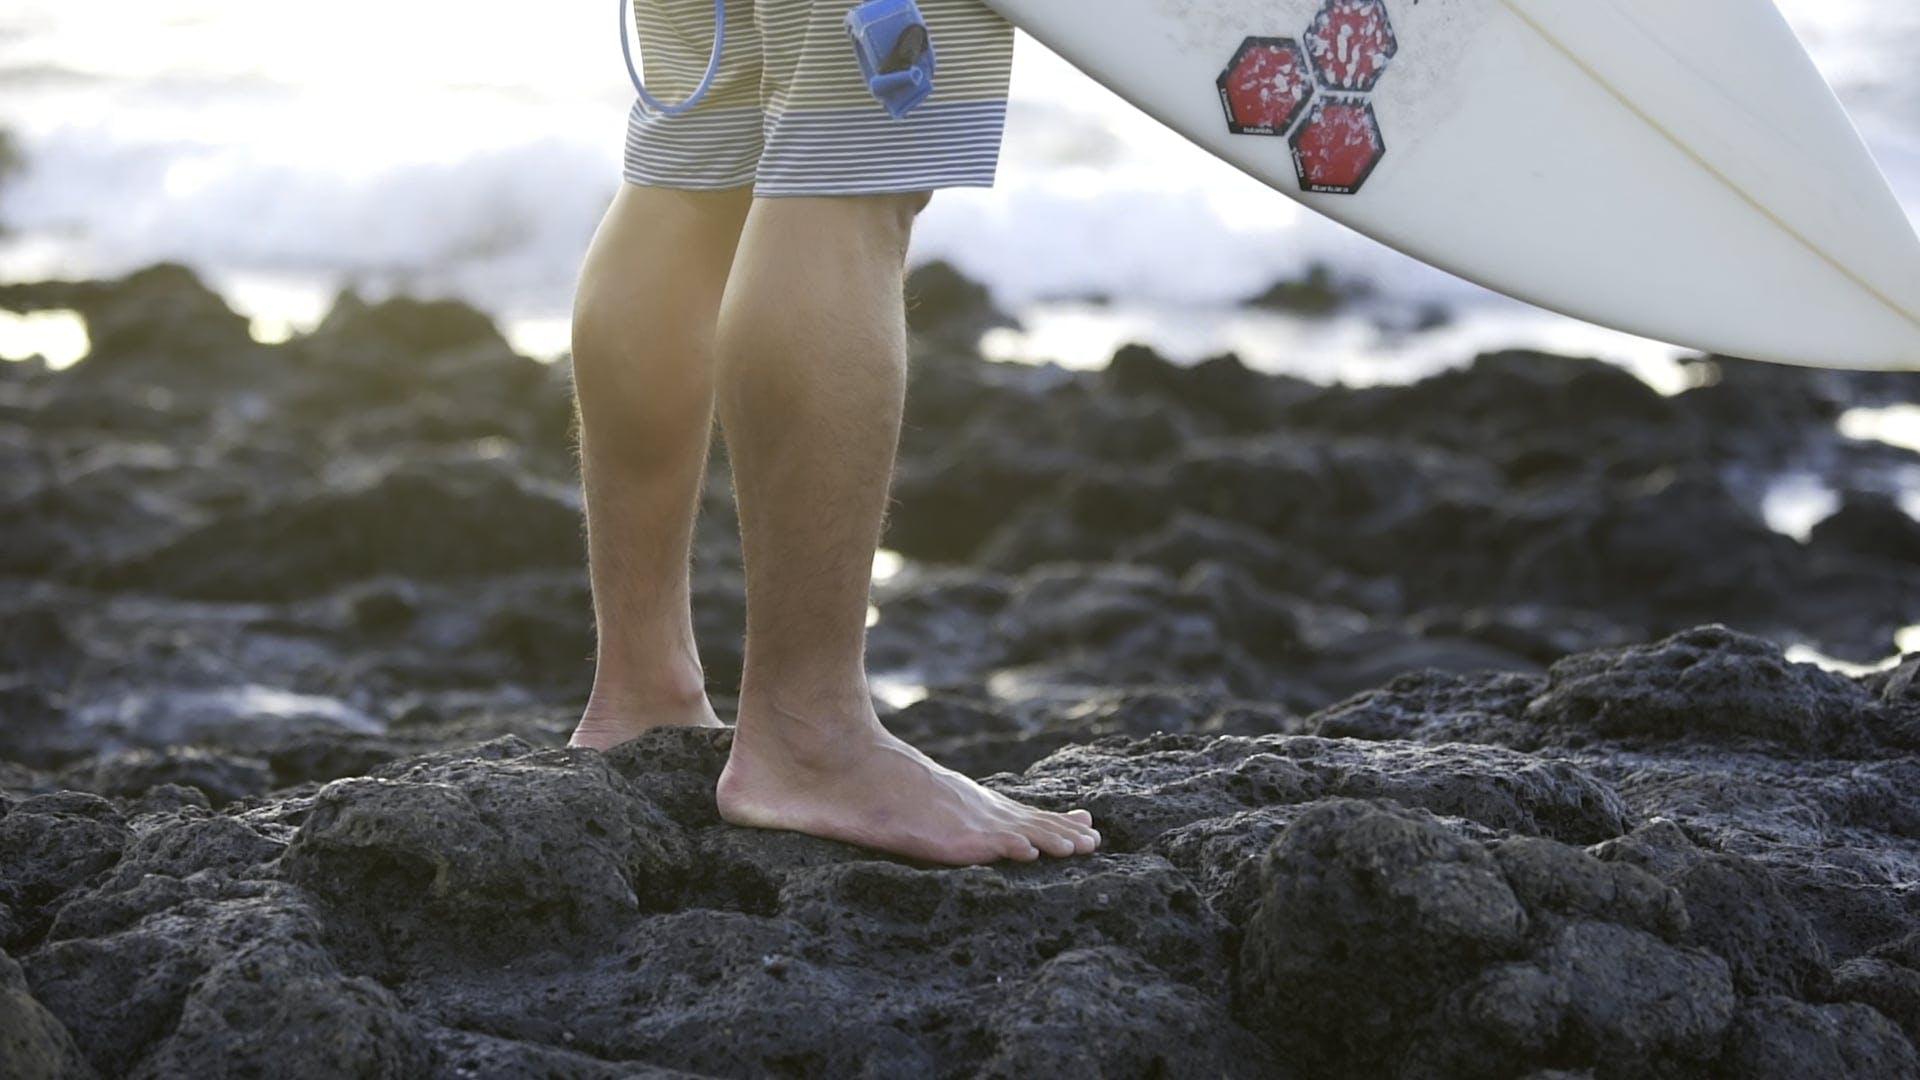 Barefoot Surfer